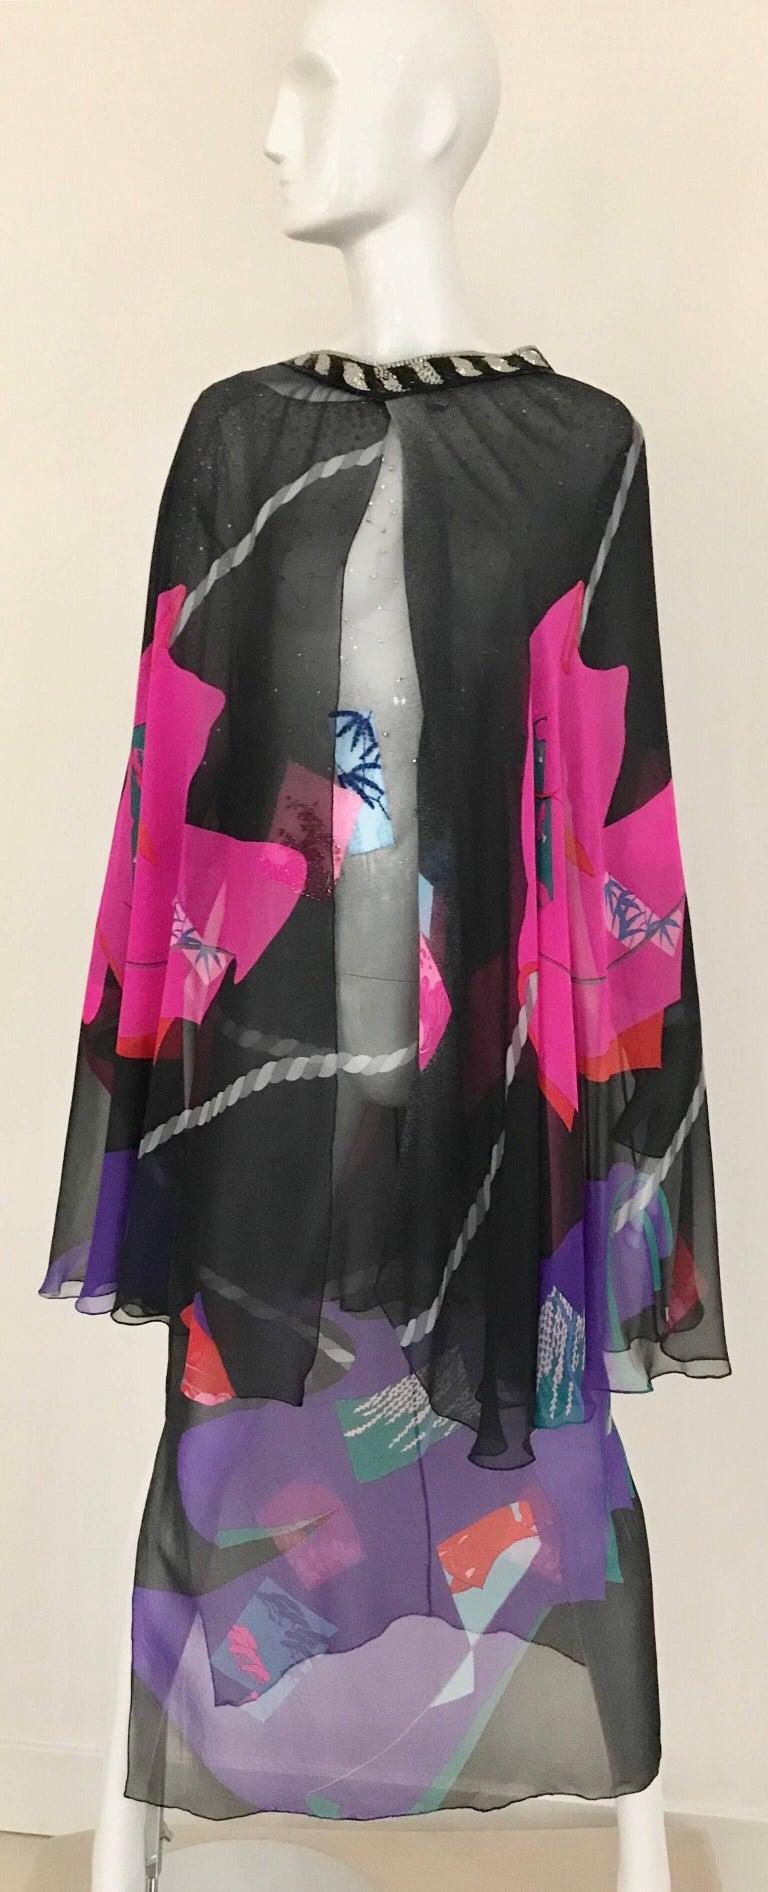 Vintage Hanae Mori Black and Pink Abstract Print Dress Skirt Ensemble For Sale 4